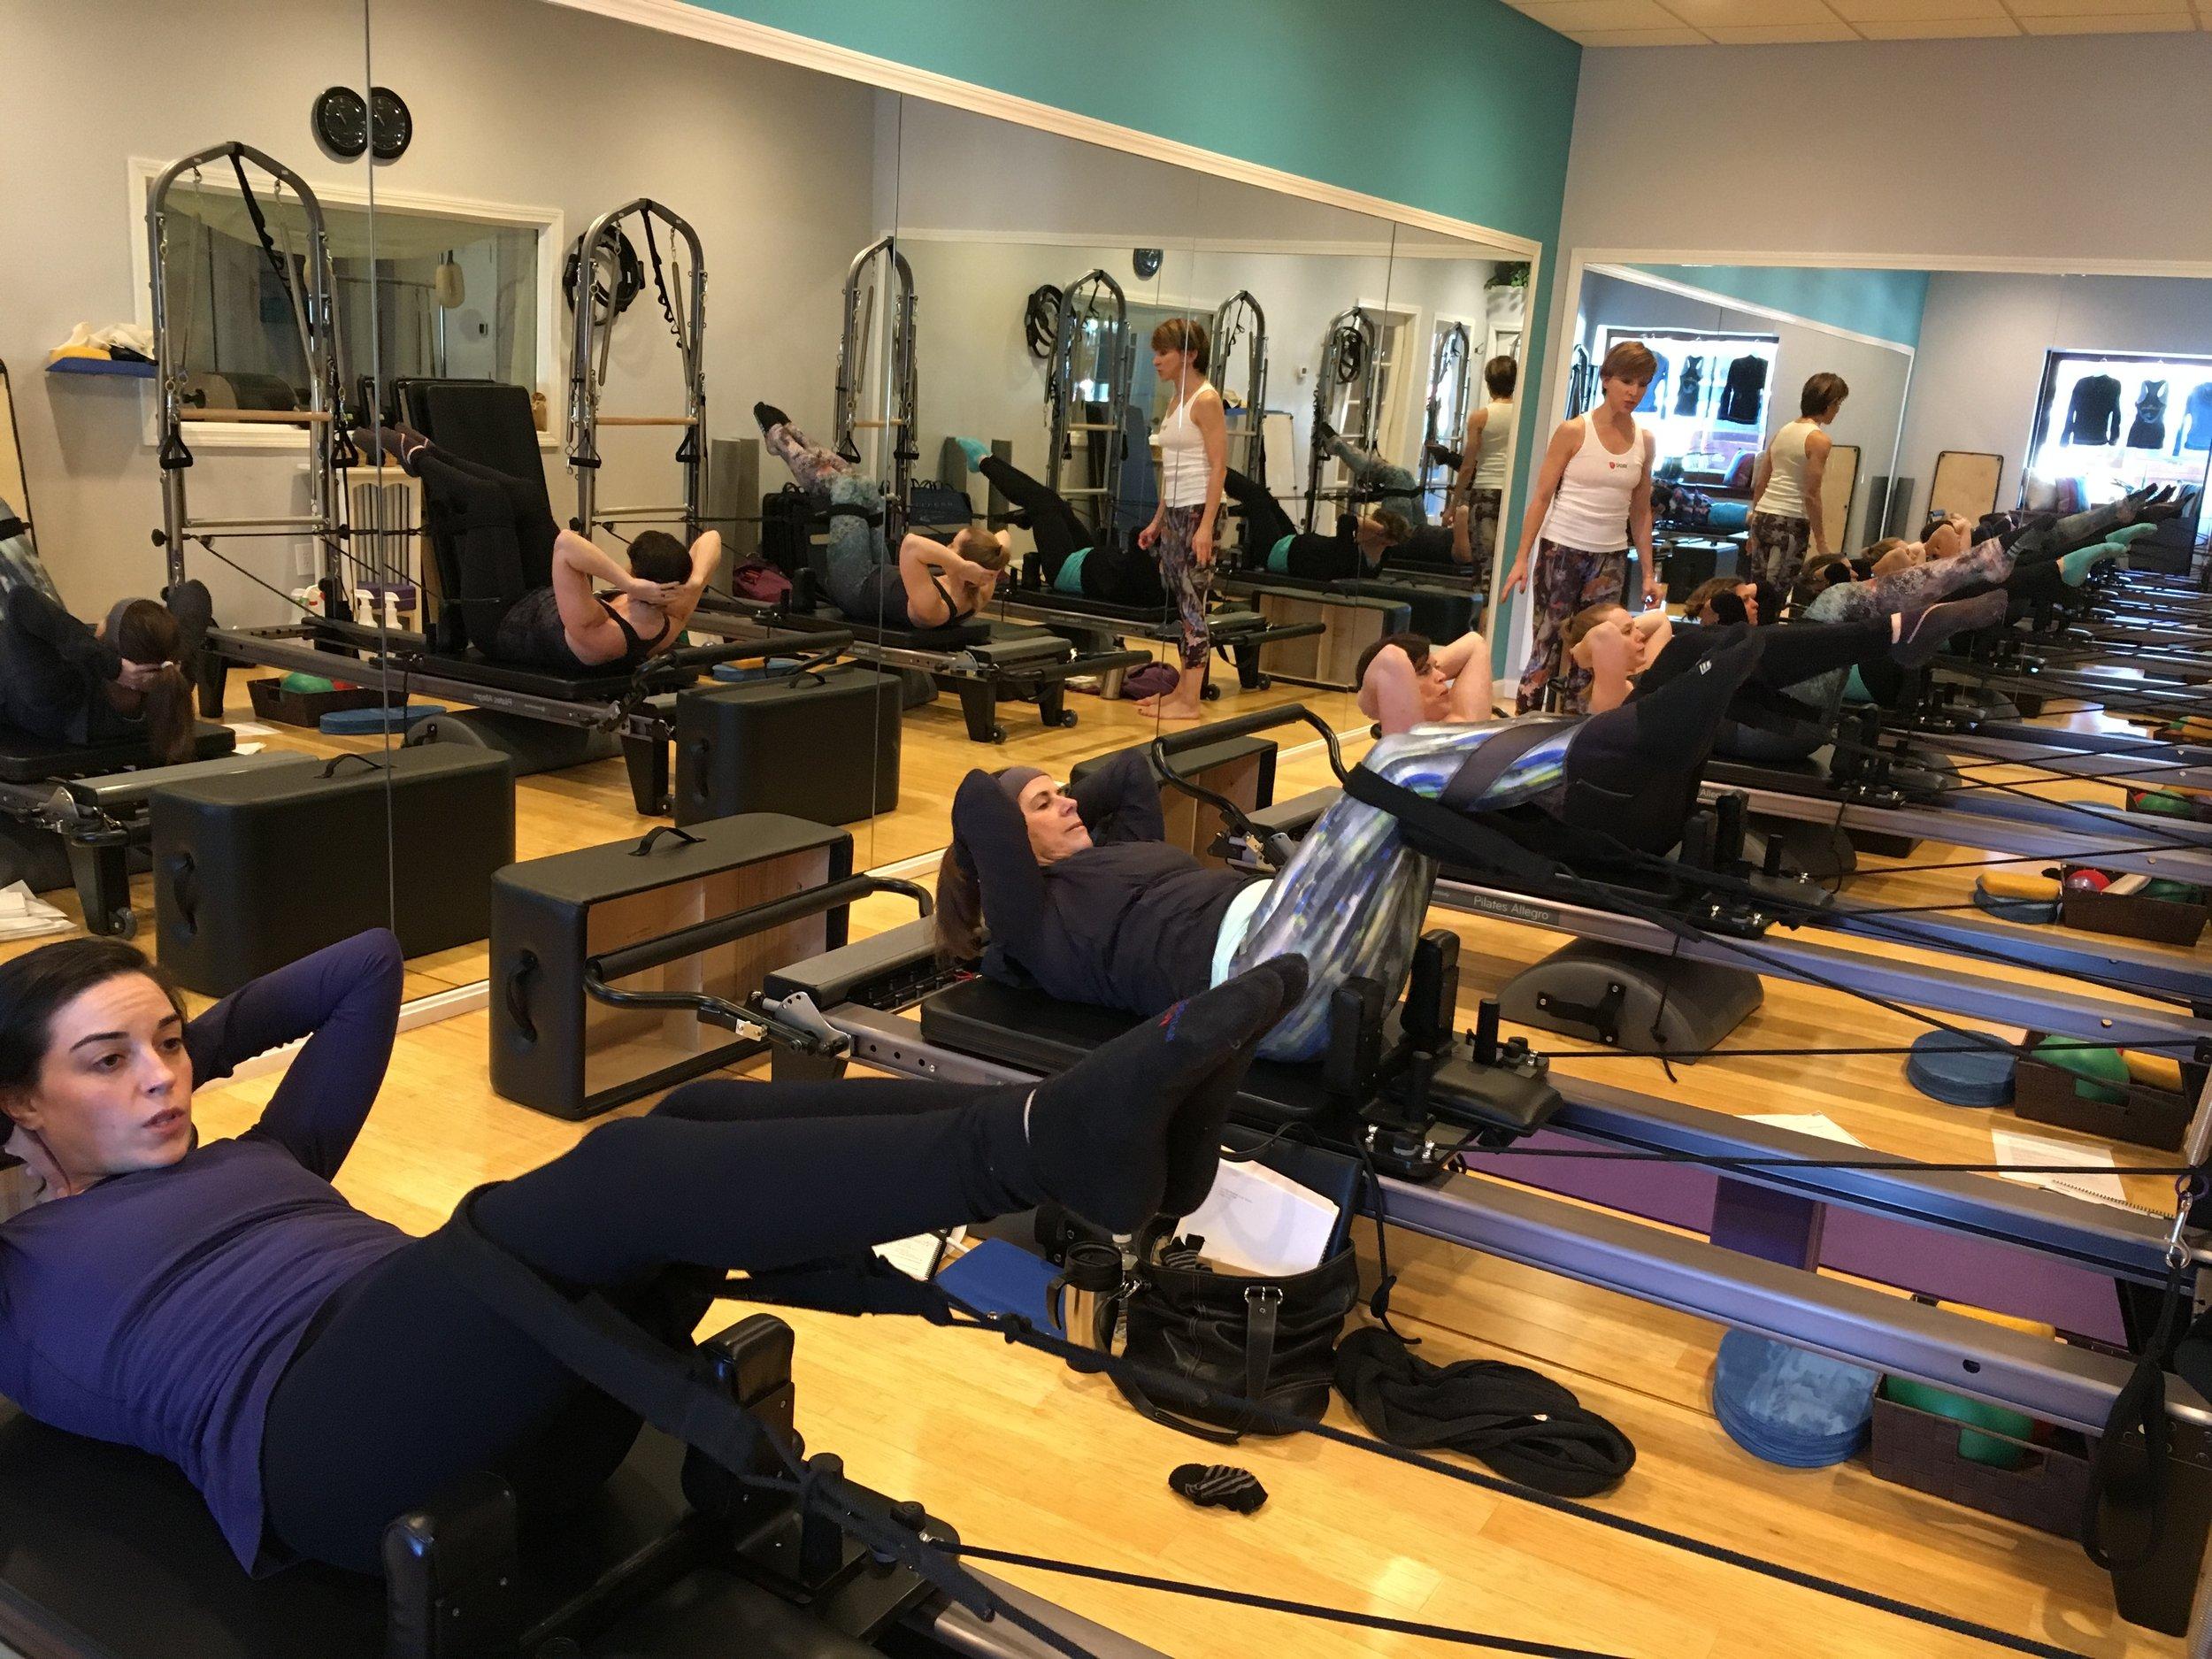 Healthy-Changes-Pilates-Reading-Abdominals.JPG